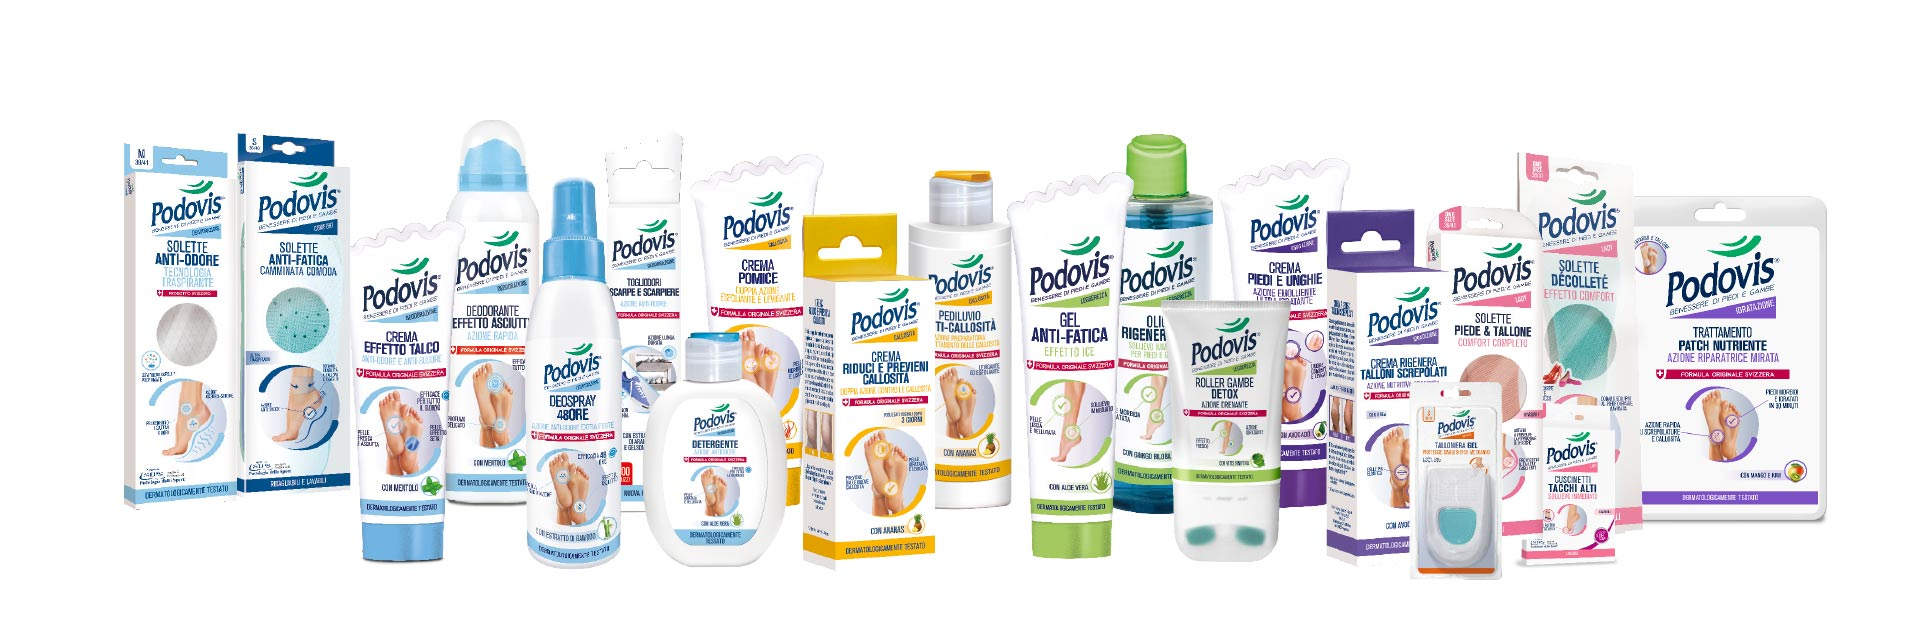 Podovis®: la linea dei prodotti.